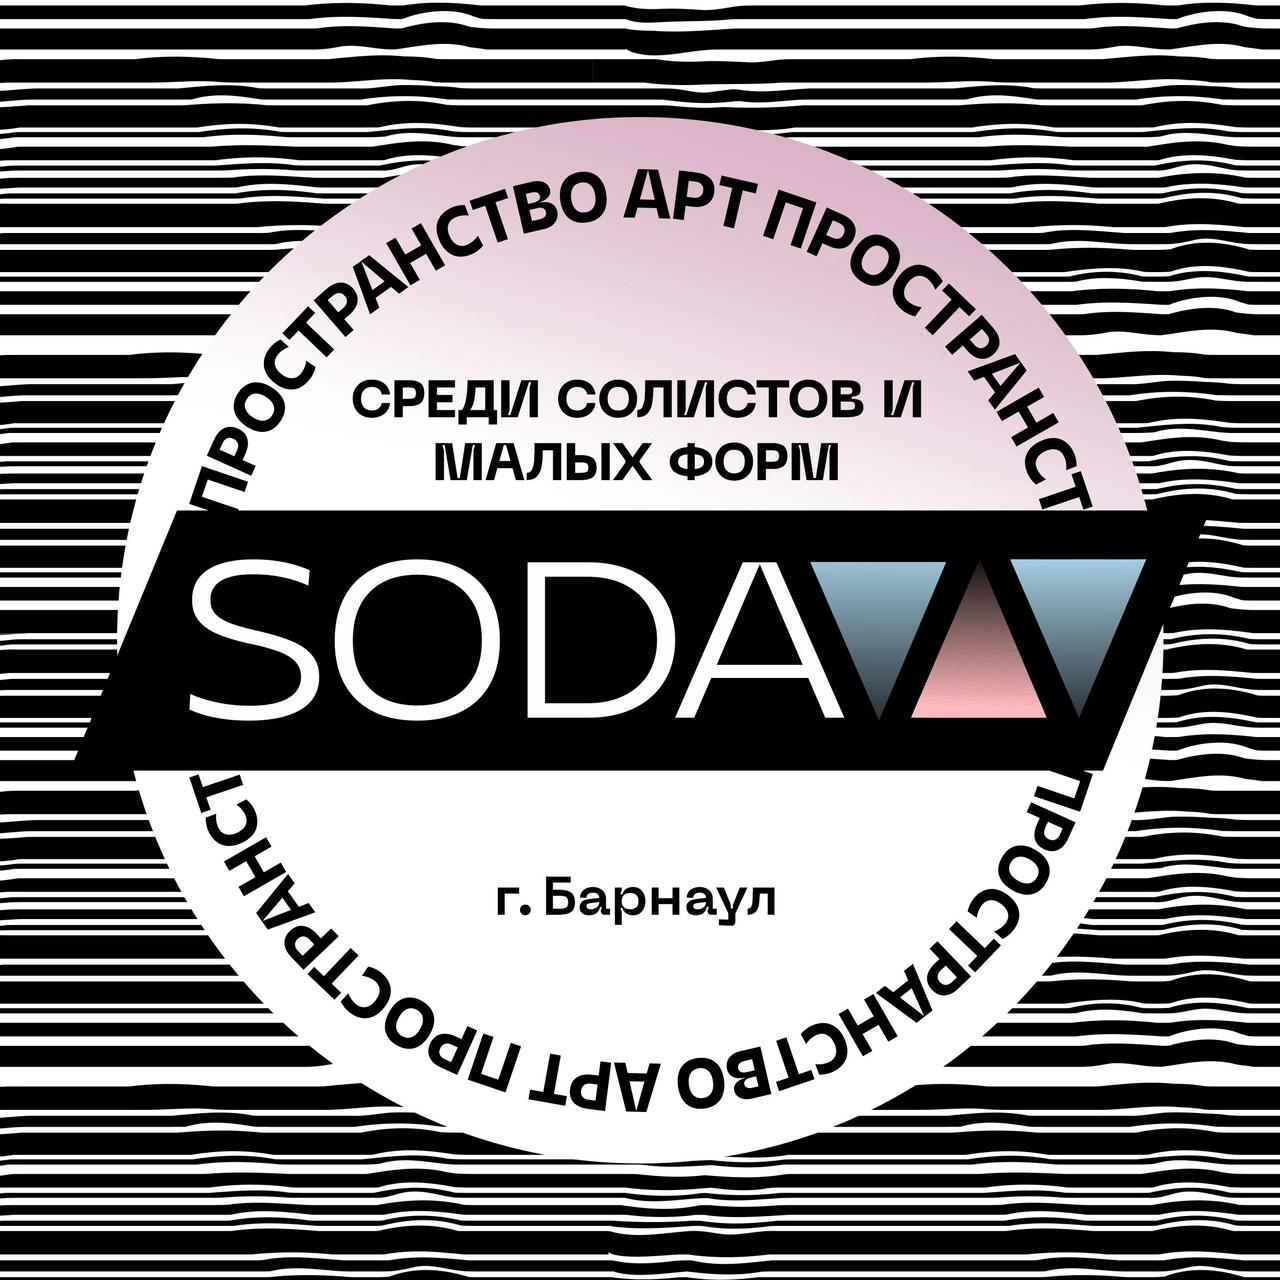 Афиша SODA АРТ пространство